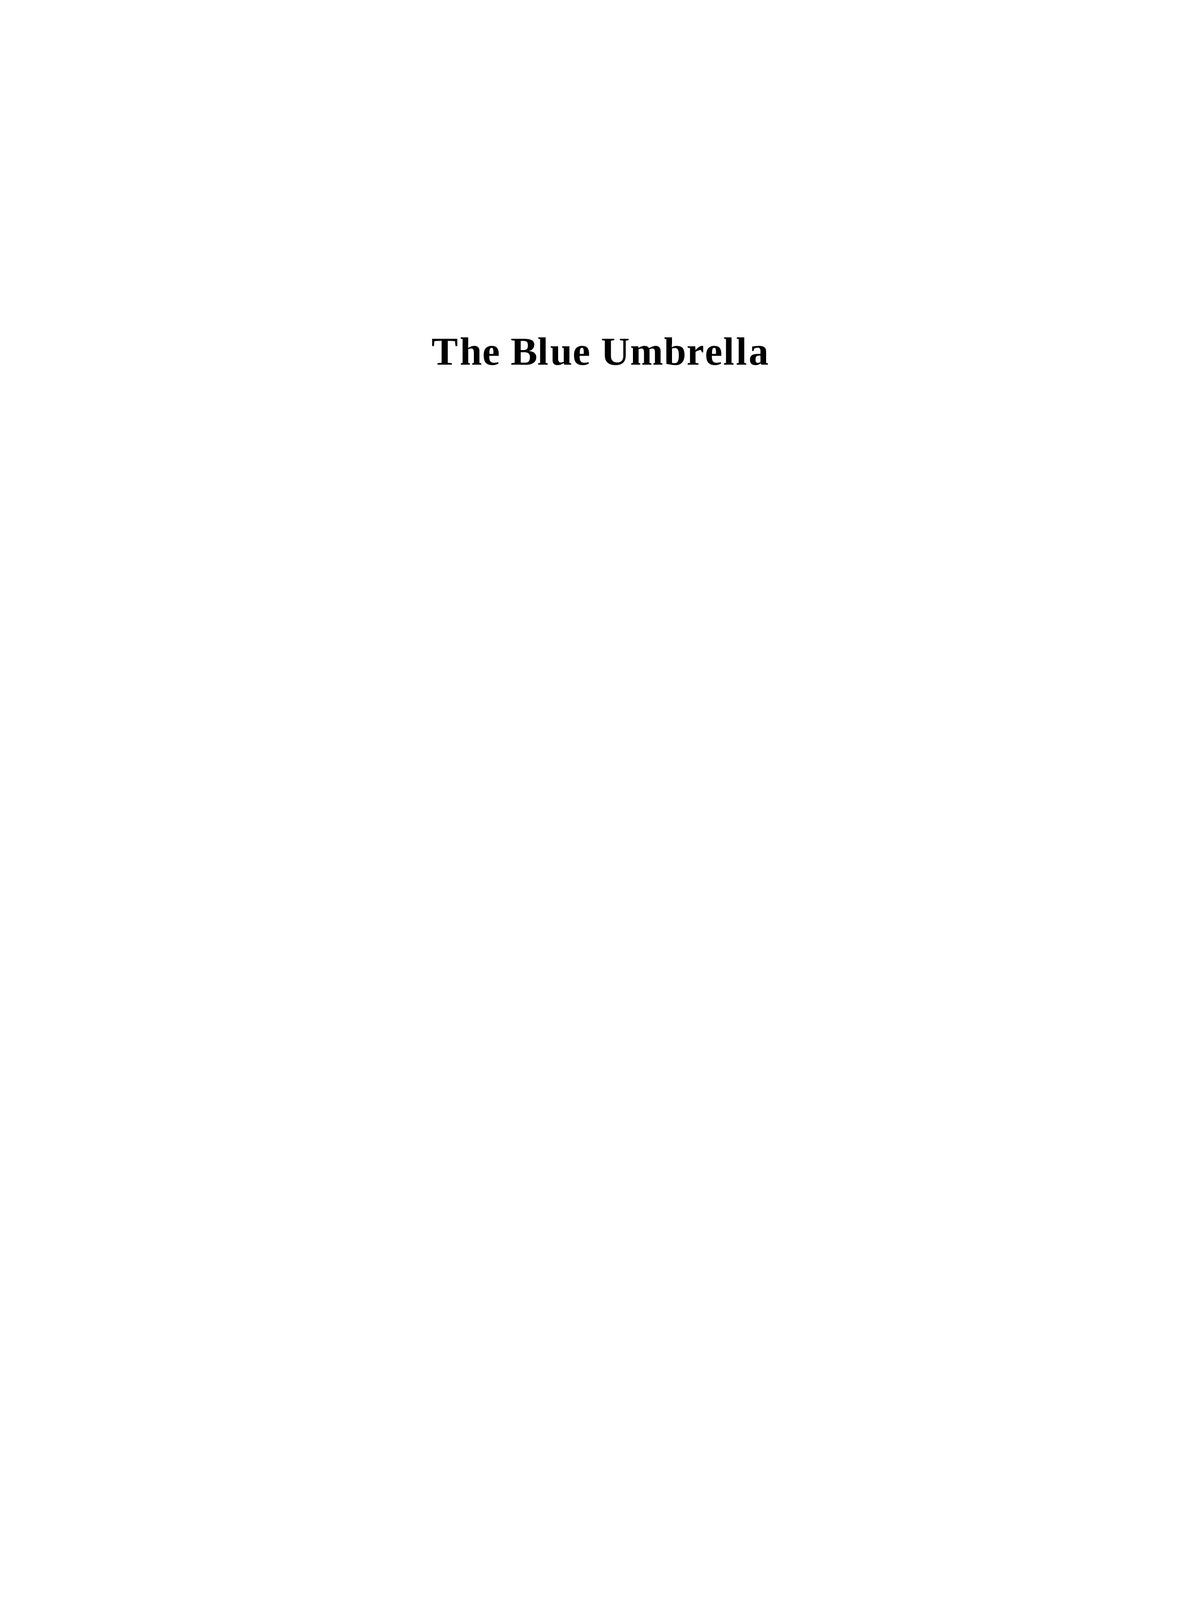 The Blue Umbrella Book by Ruskin Bond pdf